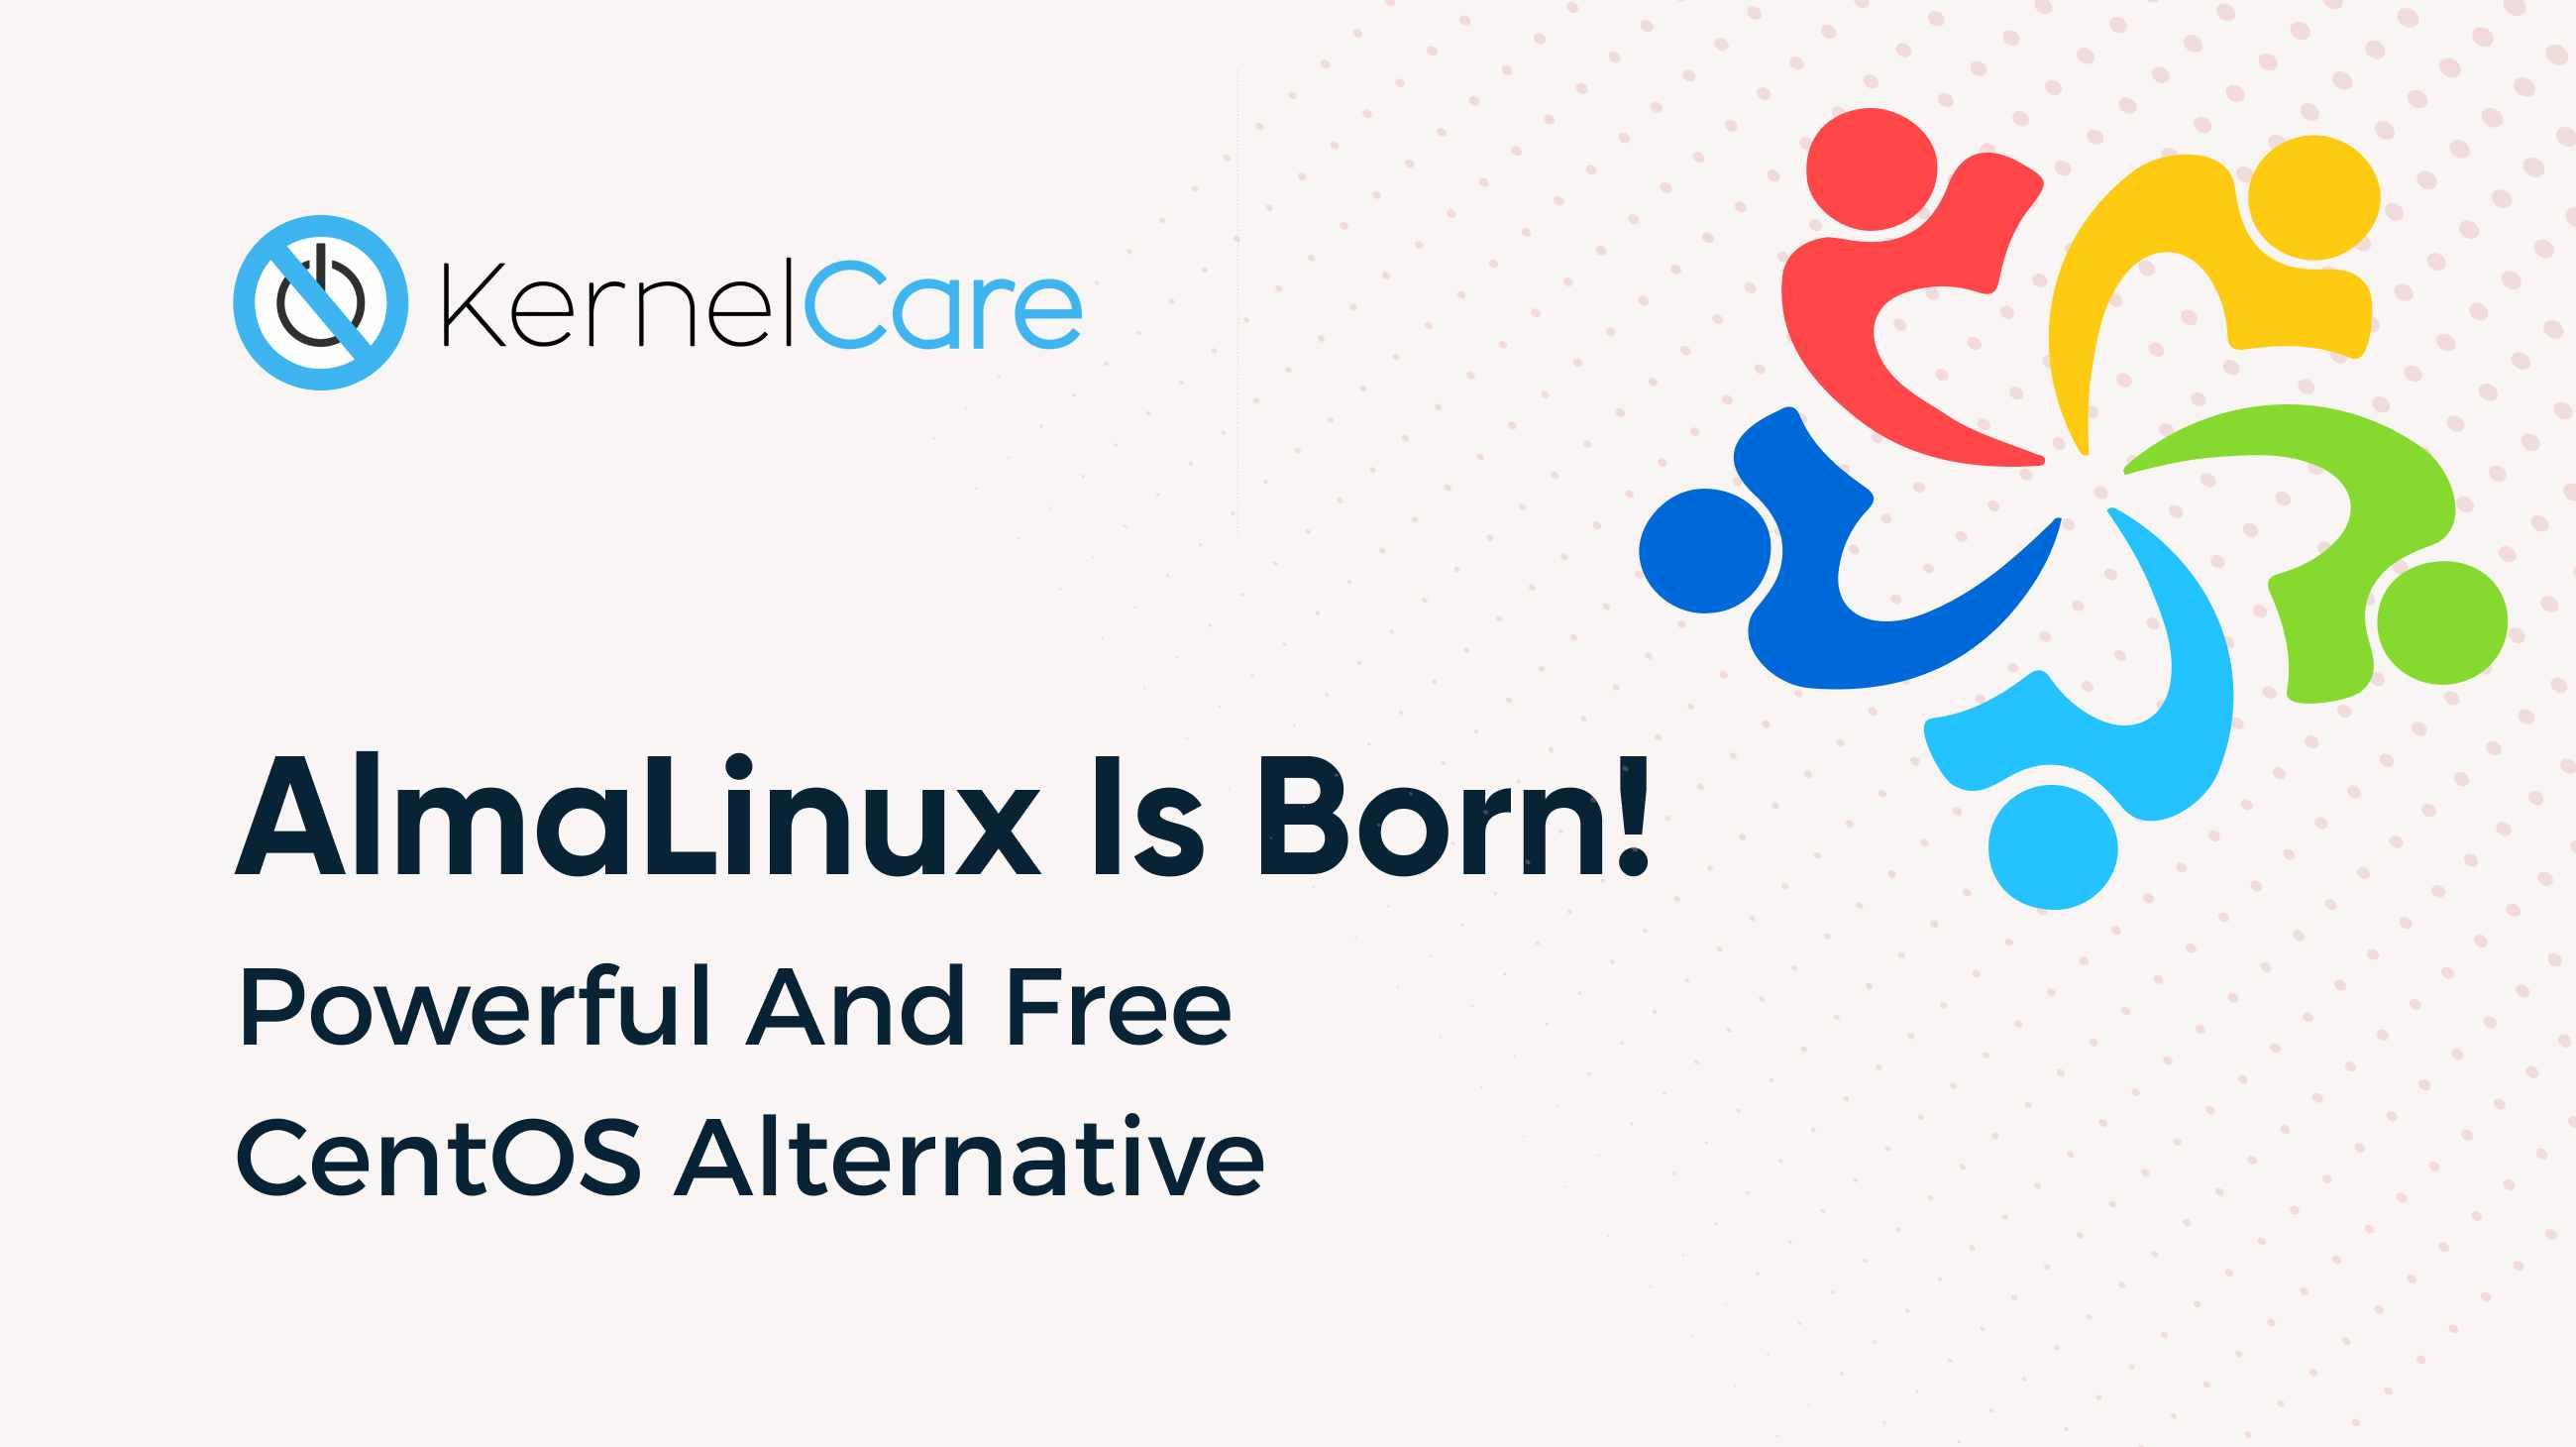 AlmaLinux is born powerful CentOS alternative